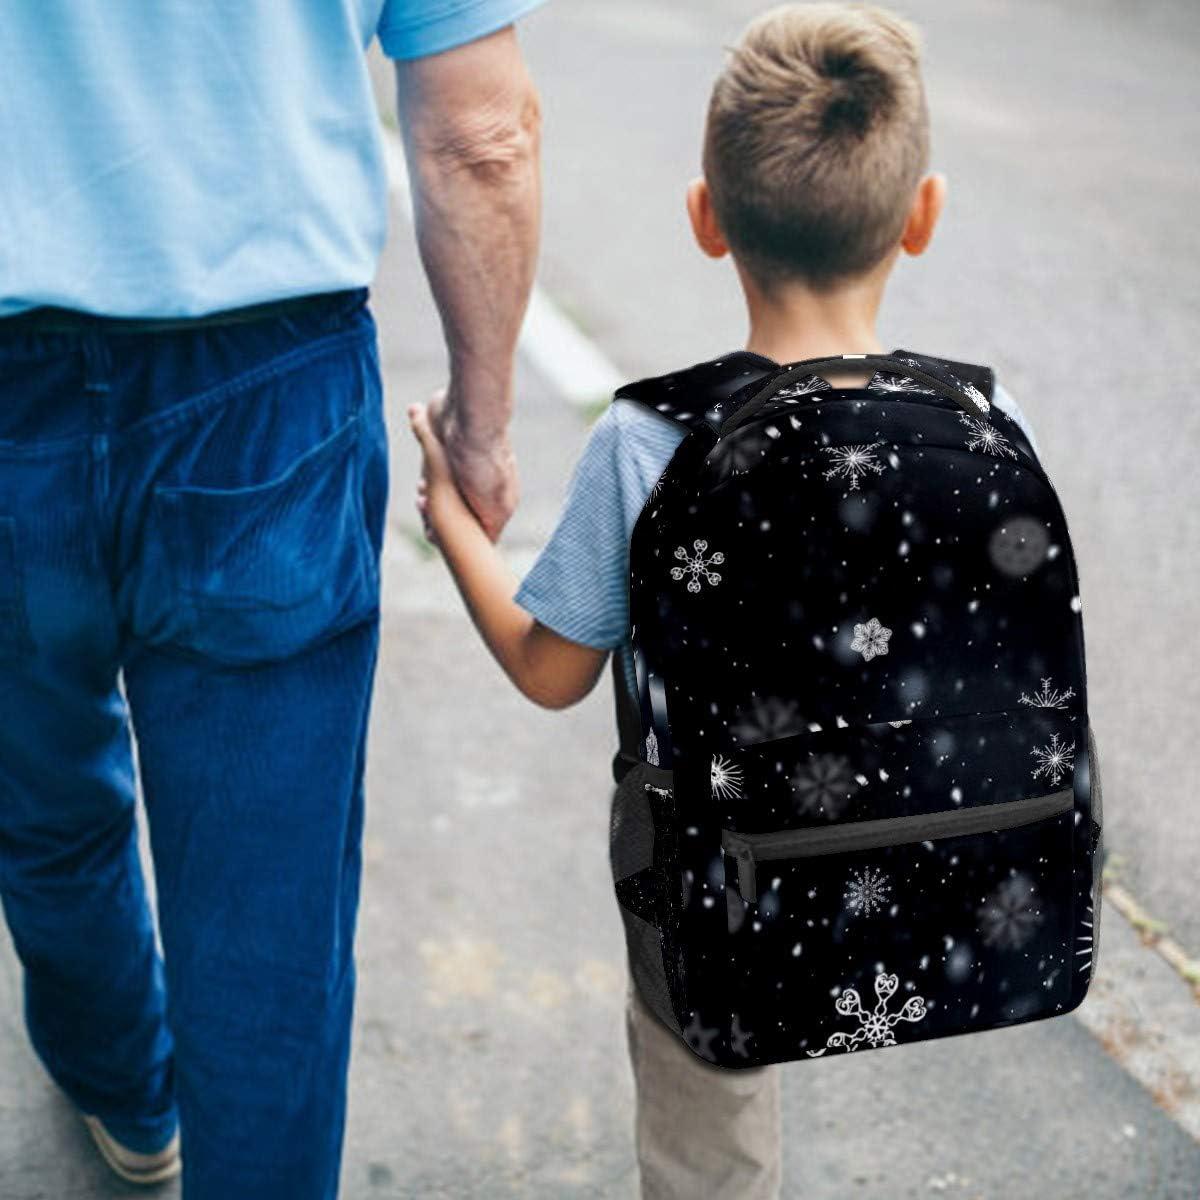 Backpack School Bag Casual Travel Daypack College Bookbag Student Sports Bag Gifts for Men Women Teenage Girl Rucksack Snowflack